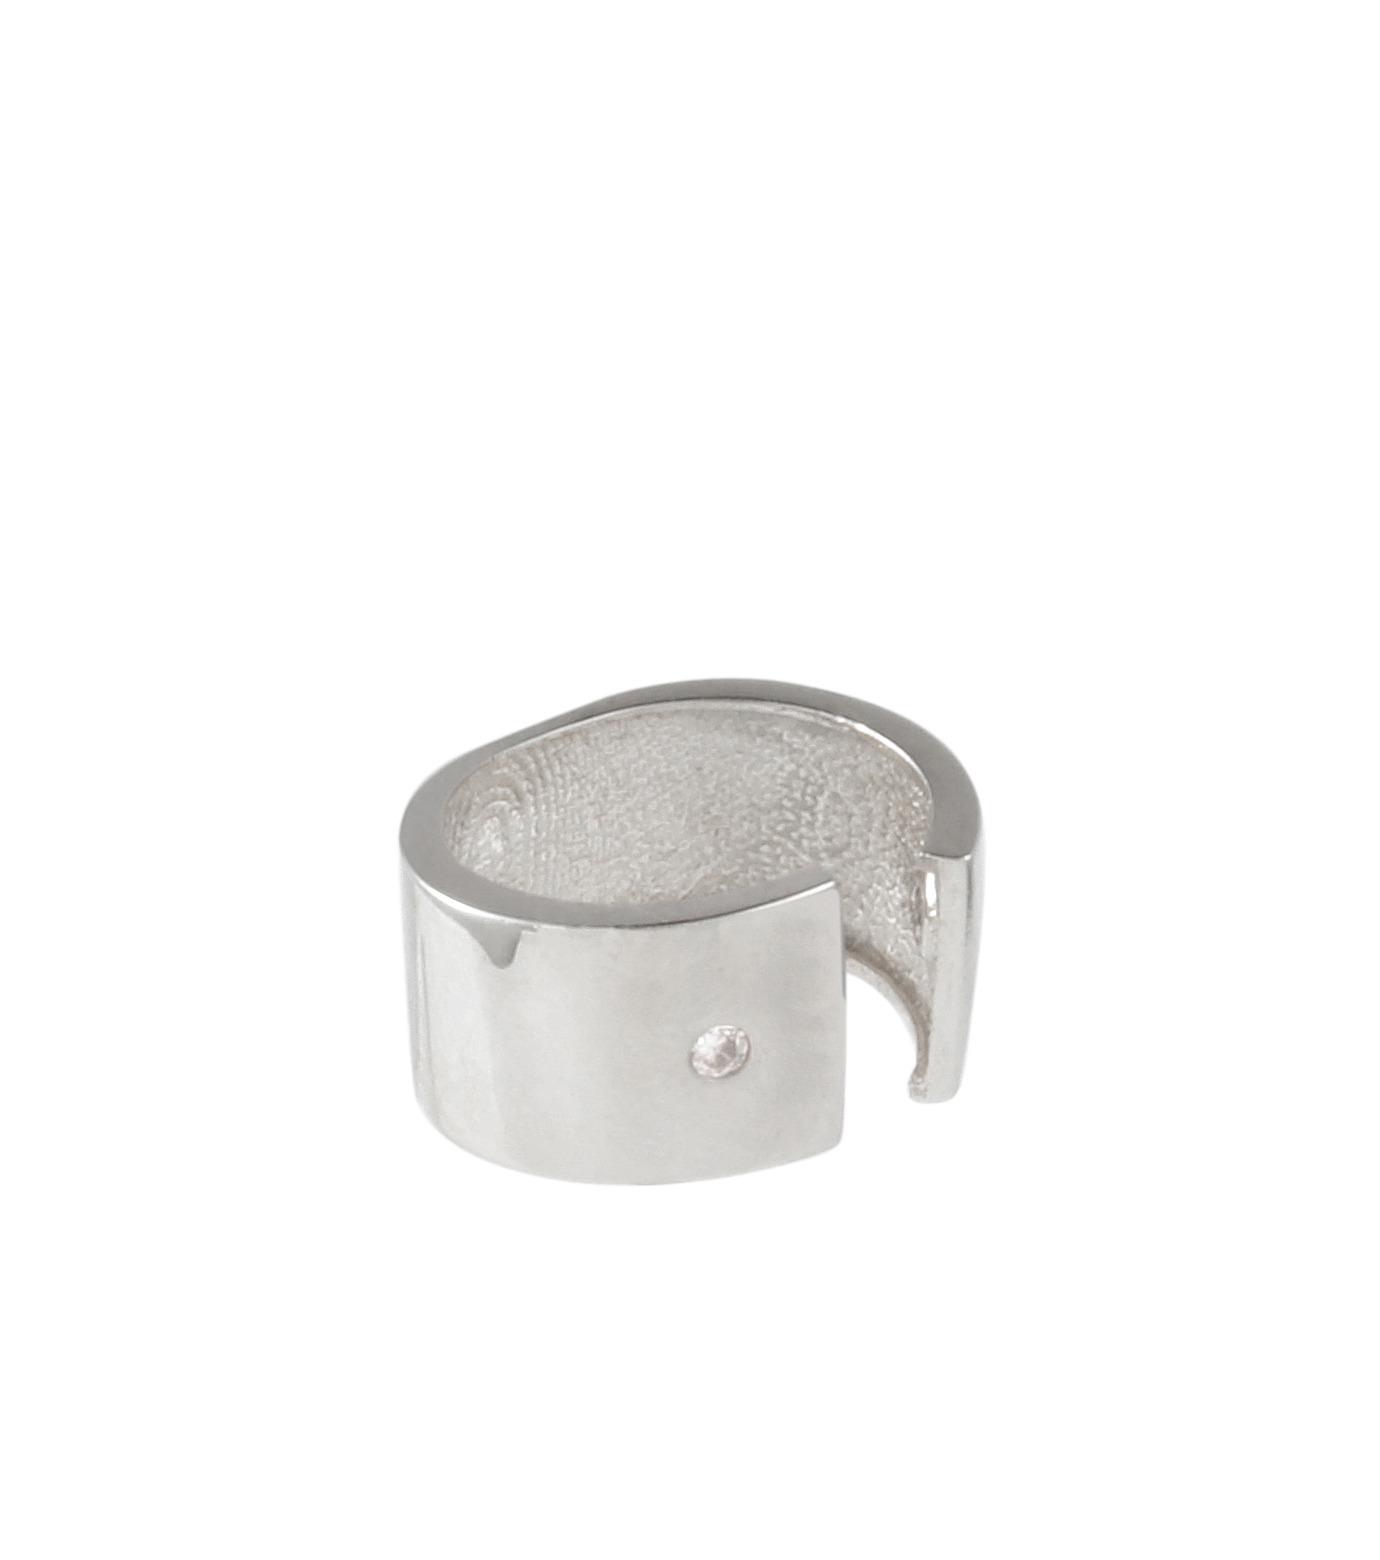 Campbell(キャンベル)のEar cuff-SILVER(アクセサリー/accessory)-T-CLASSIC-CU-1 拡大詳細画像2